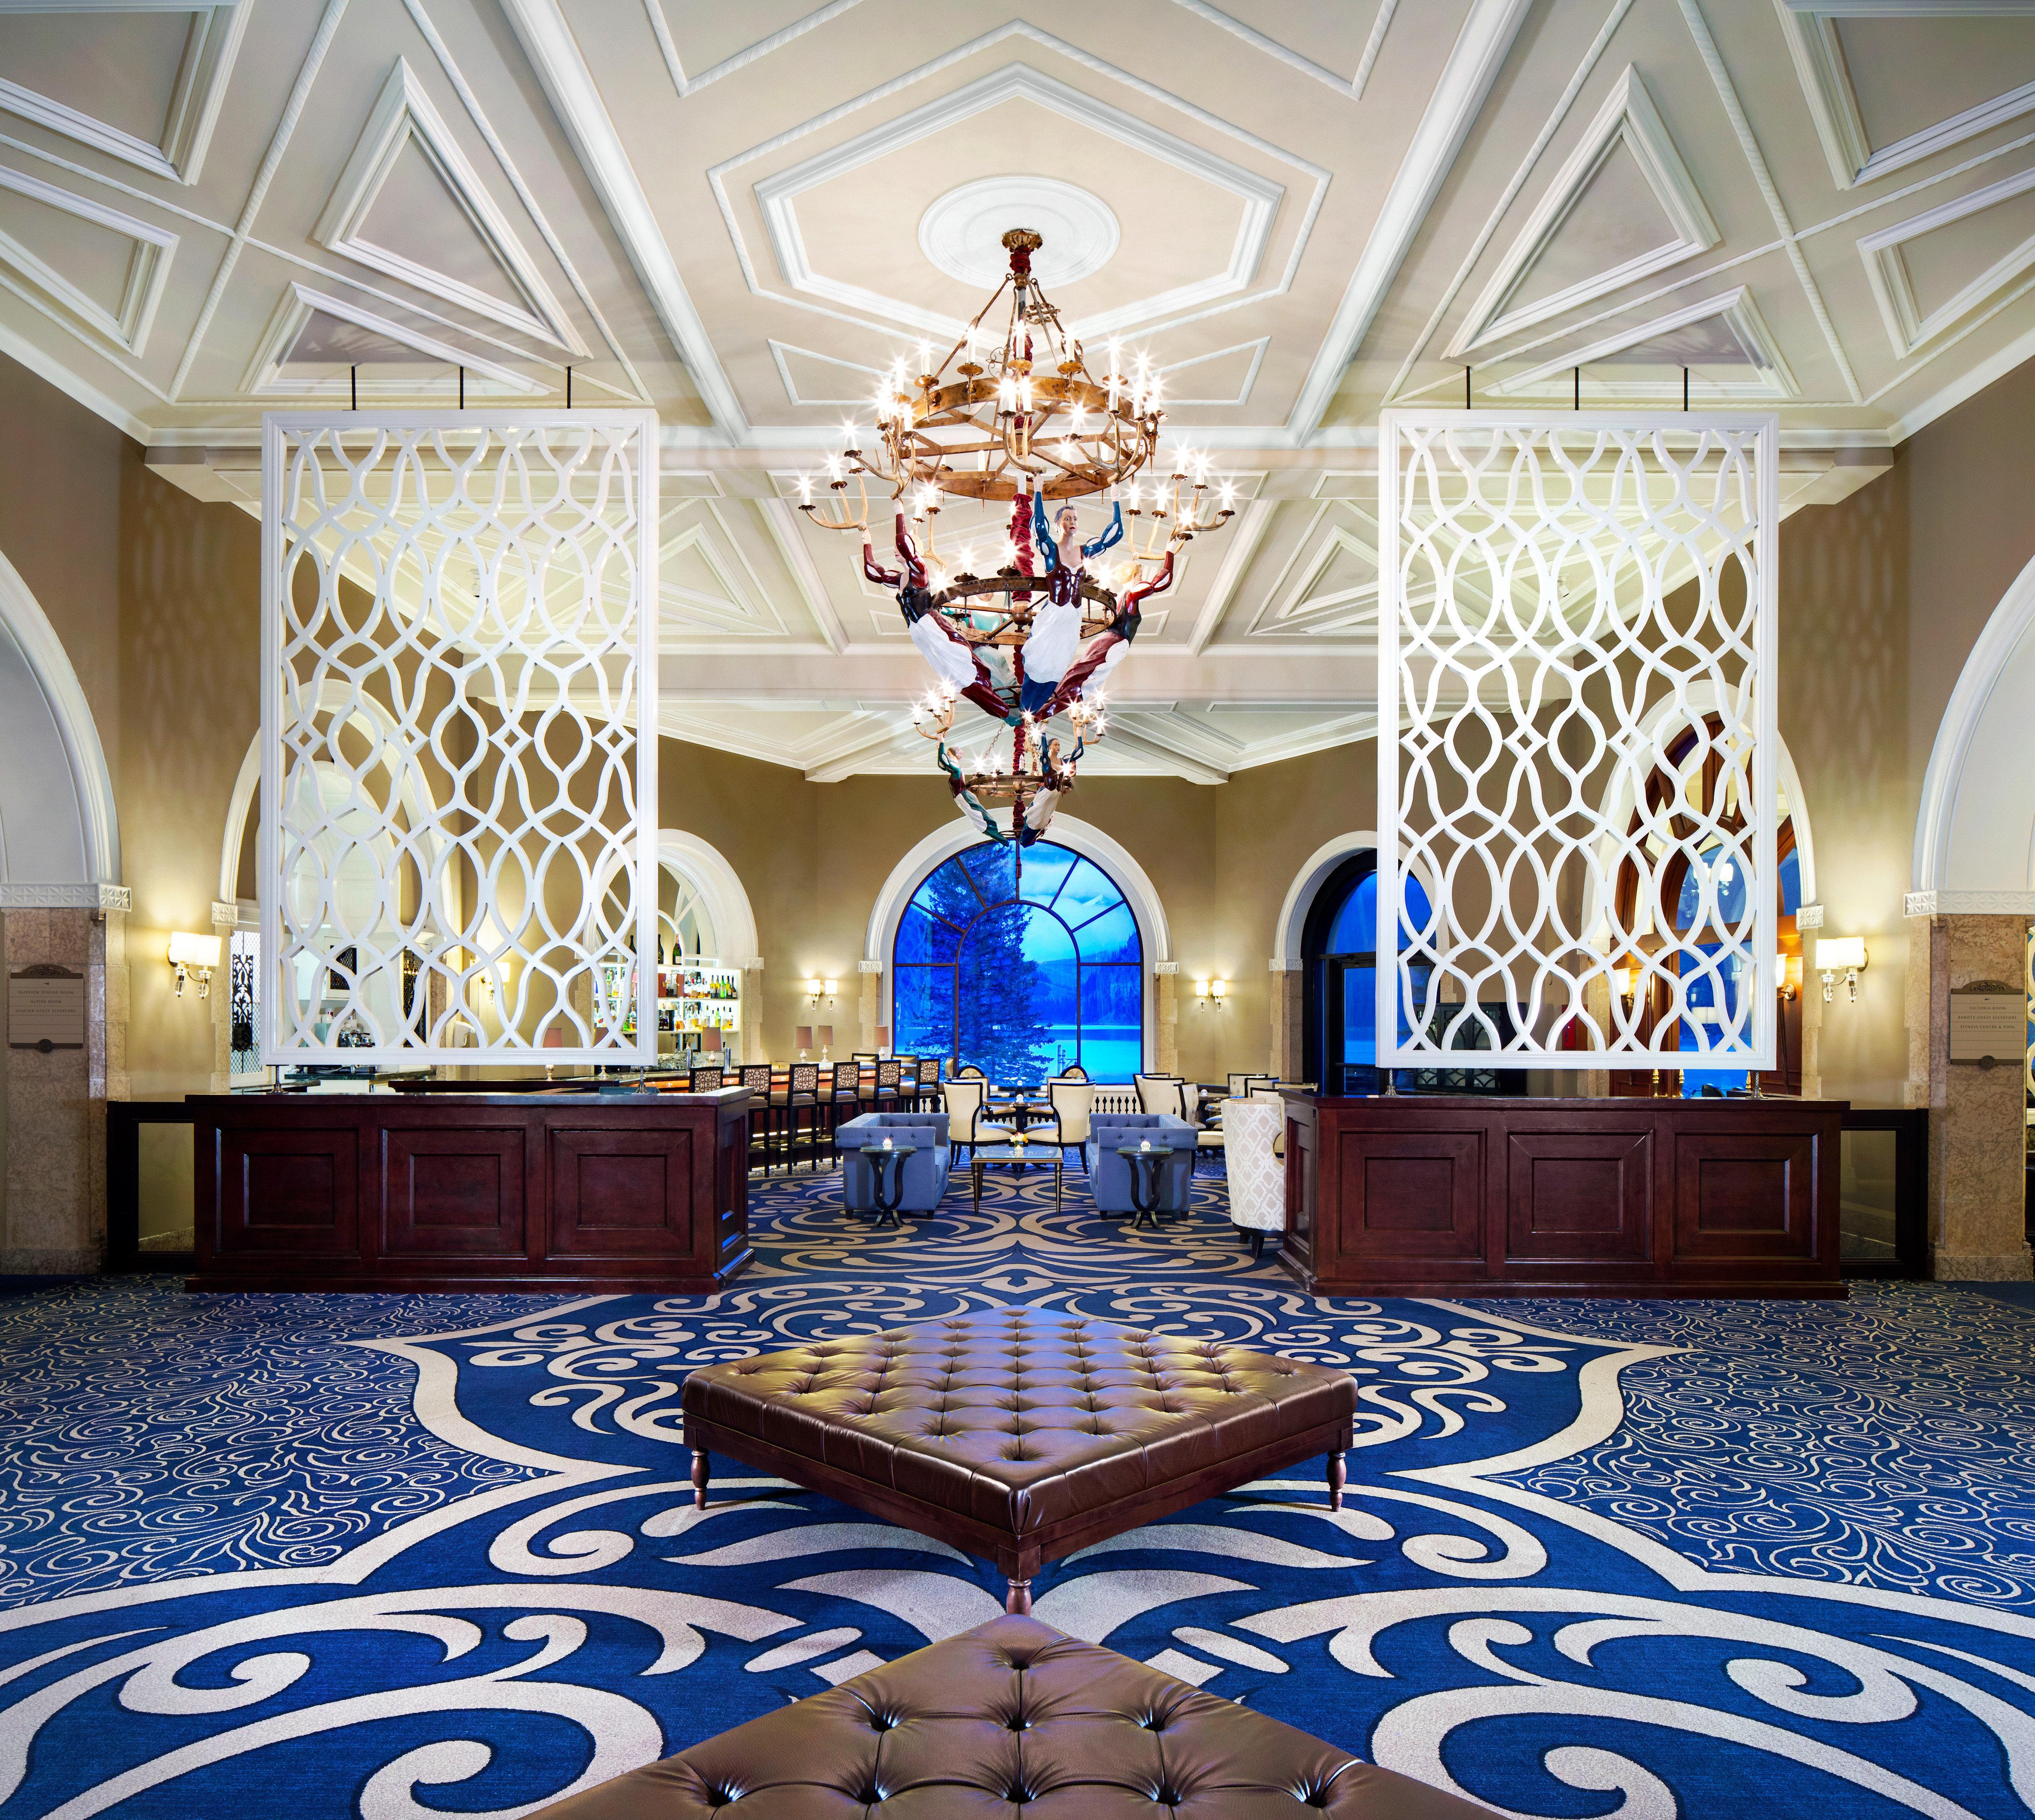 Lobby Resort function hall mansion blue living room ballroom palace rug